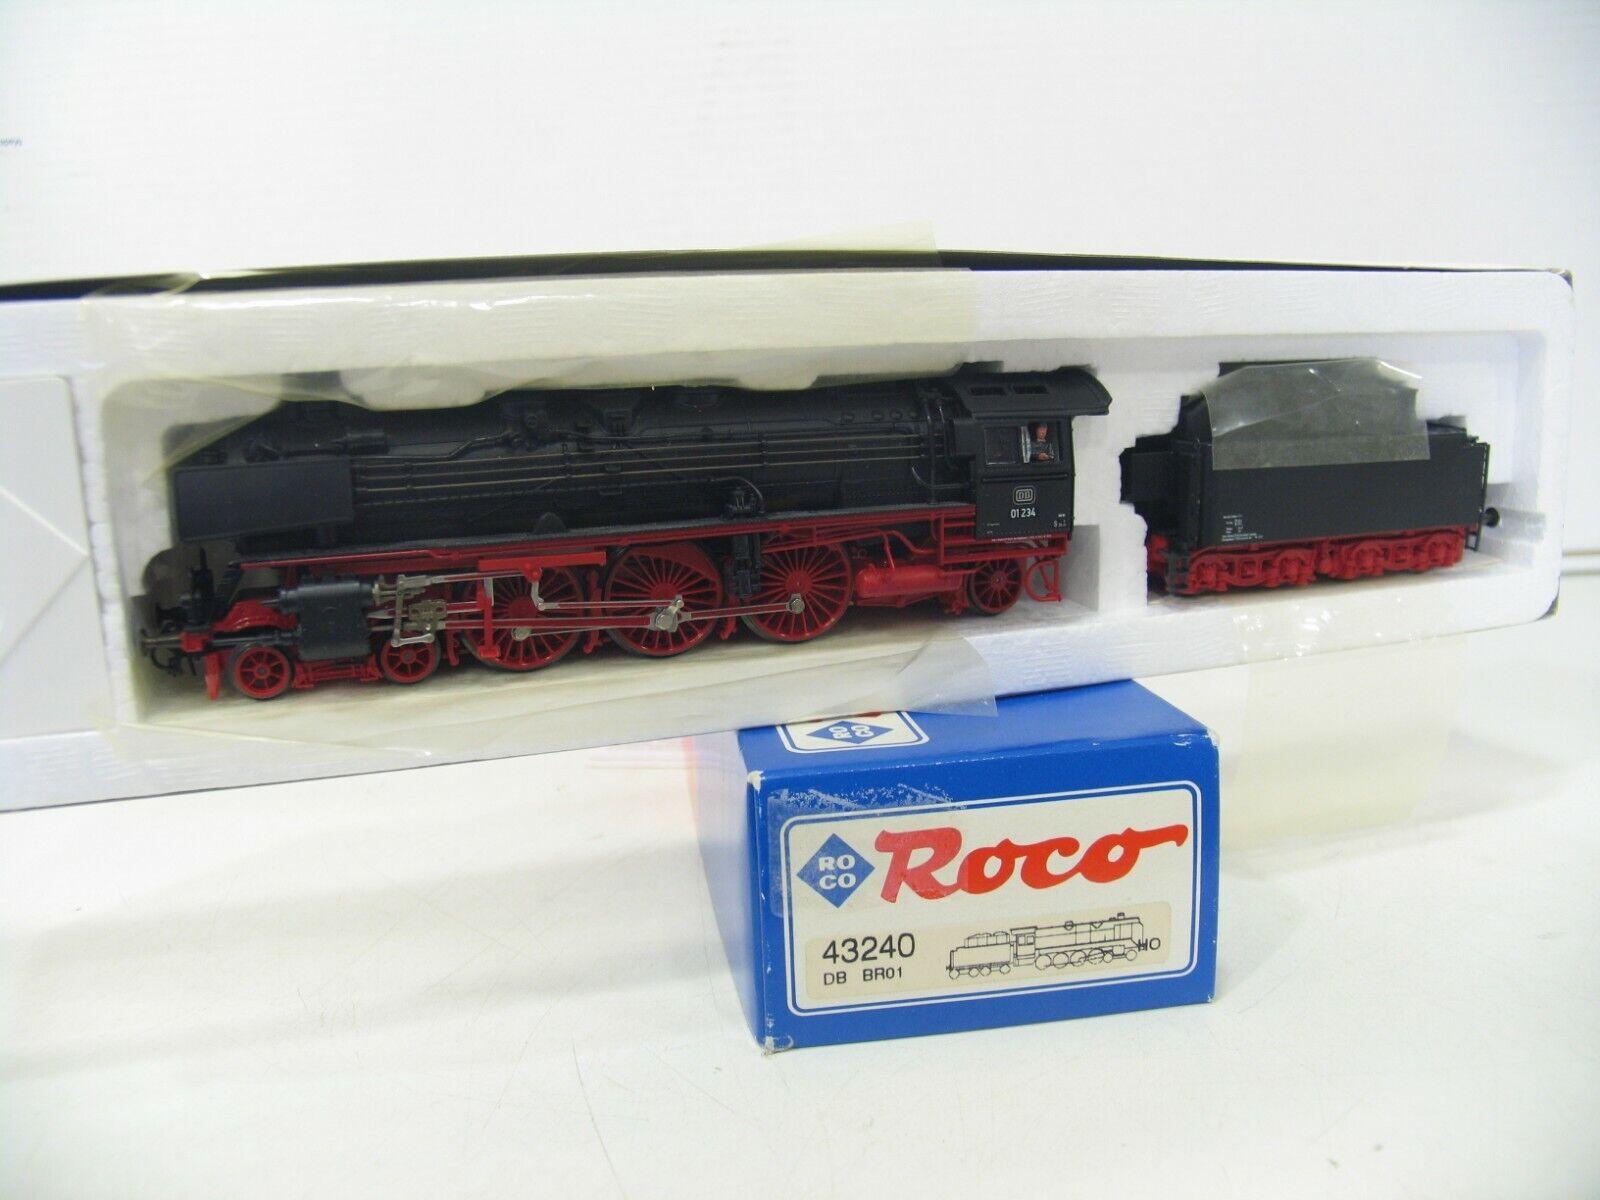 Roco 43240 dampflok BR 01 234 der DB K - hn digitalizador nh2450